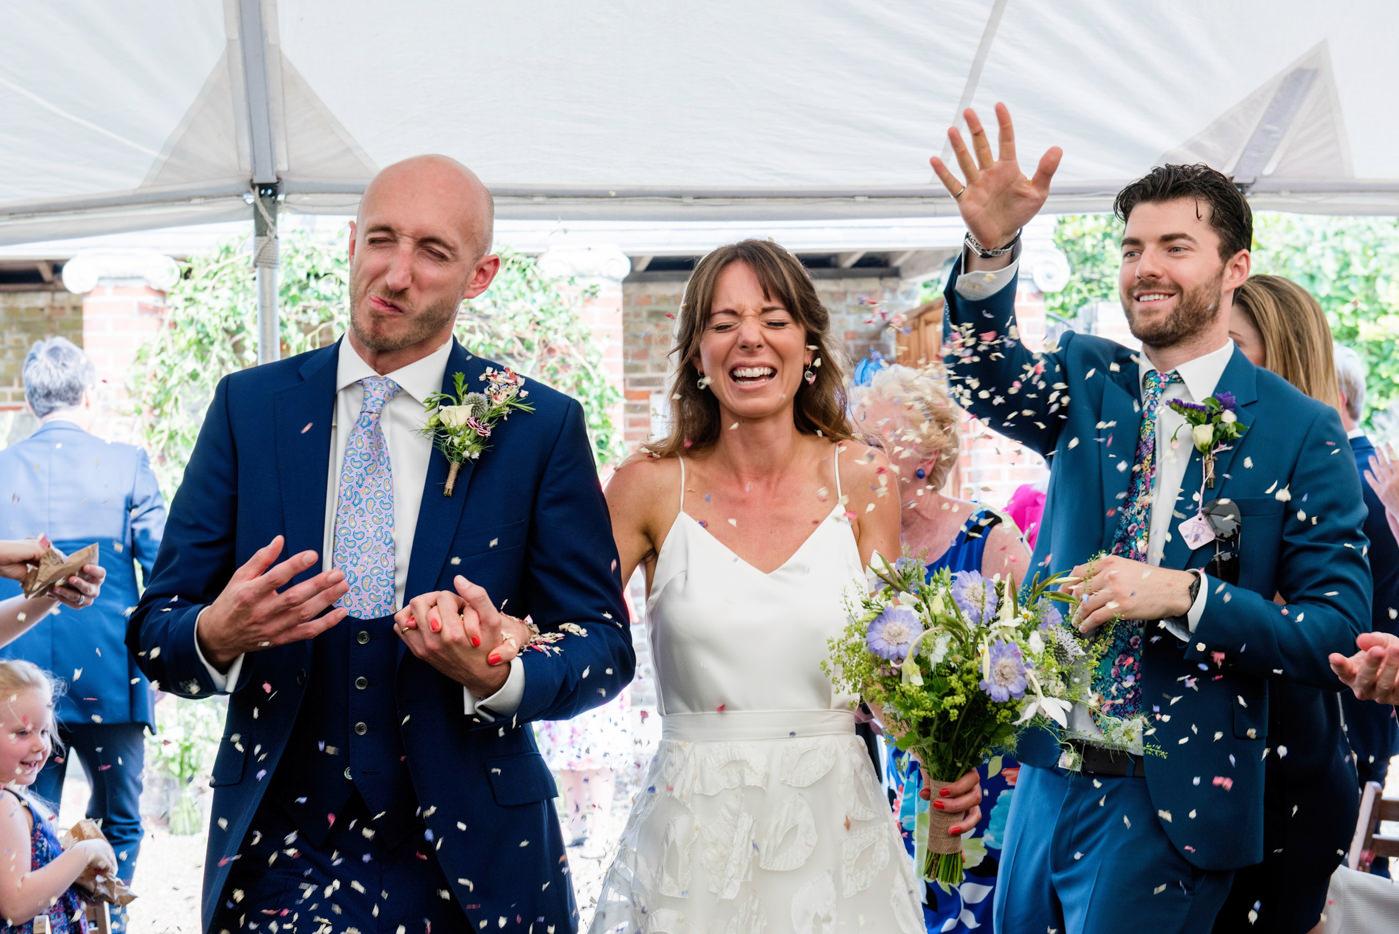 Beautiful bride Robyn wears a wedding dress by Halfpenny London